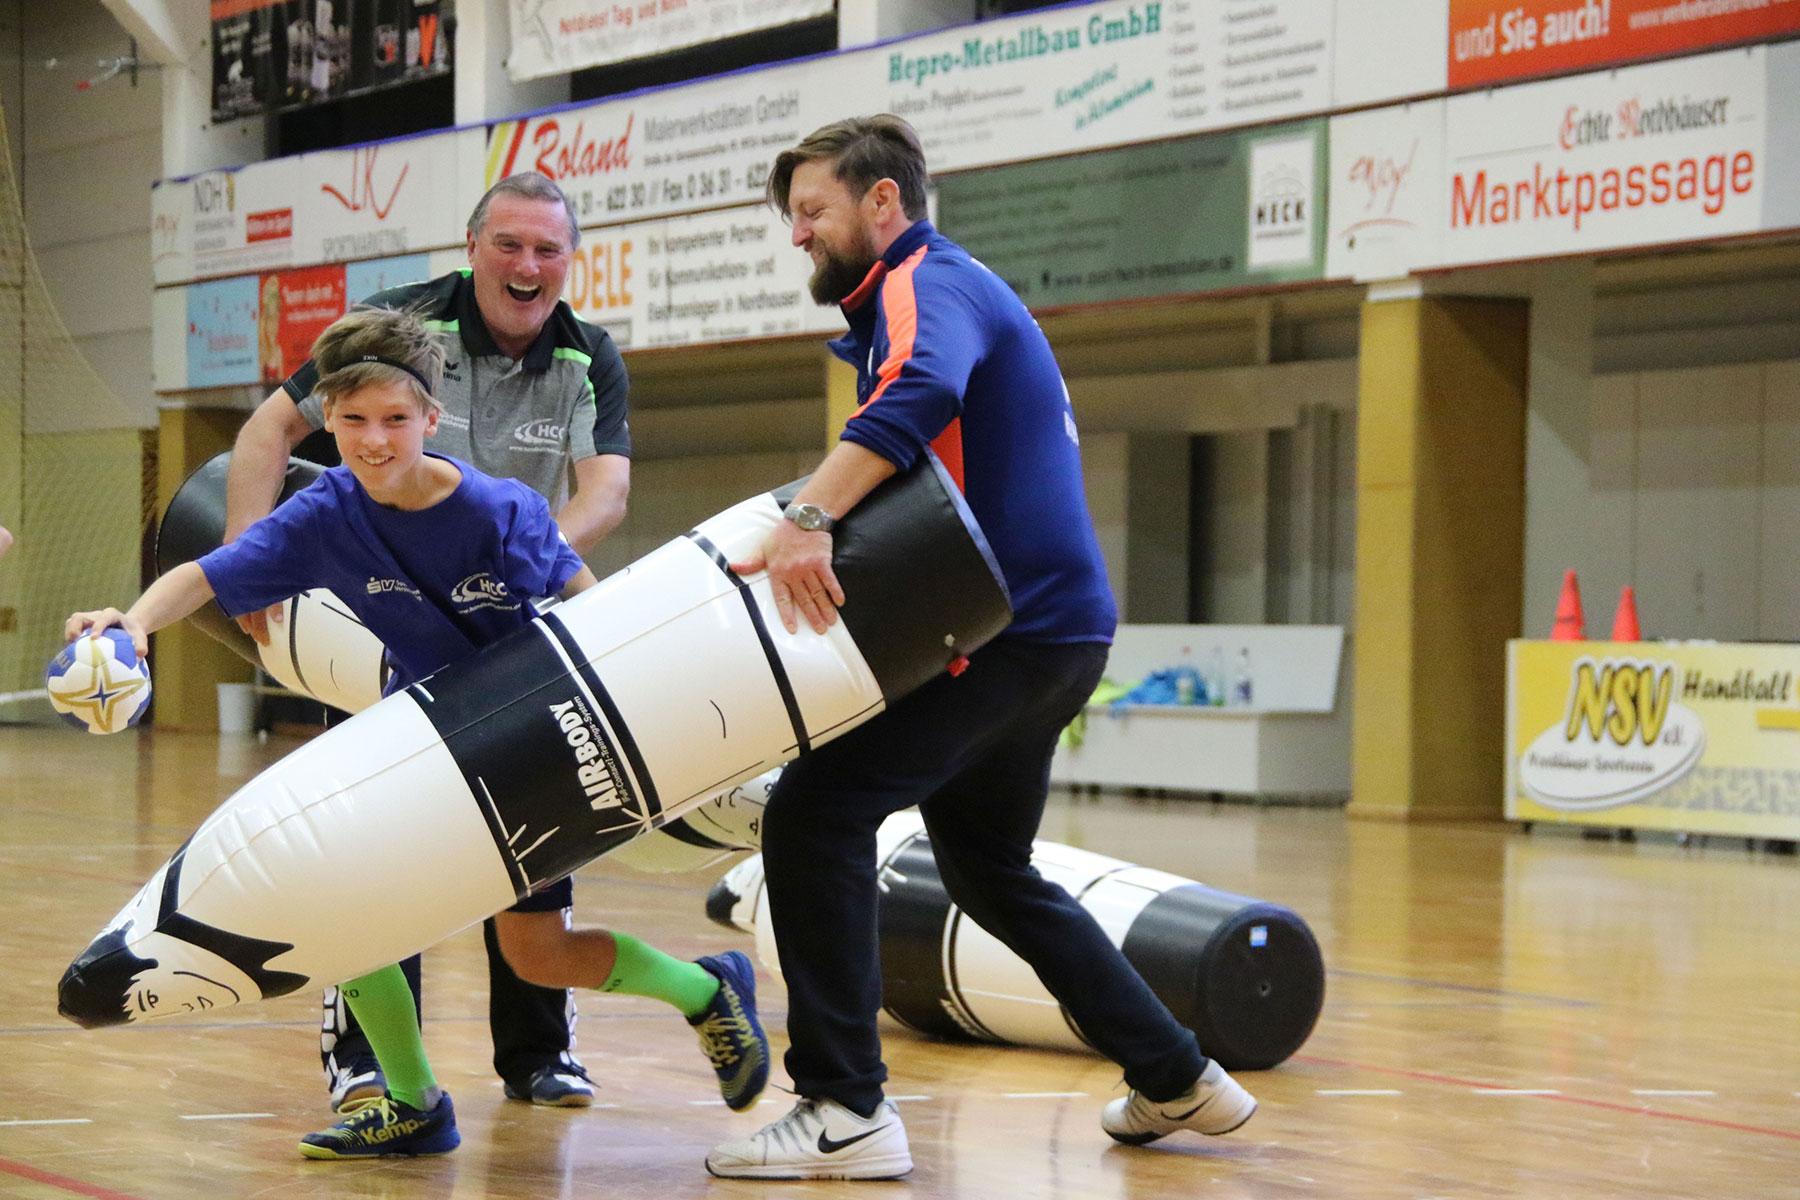 201809_Handballcamp_NDH (69)